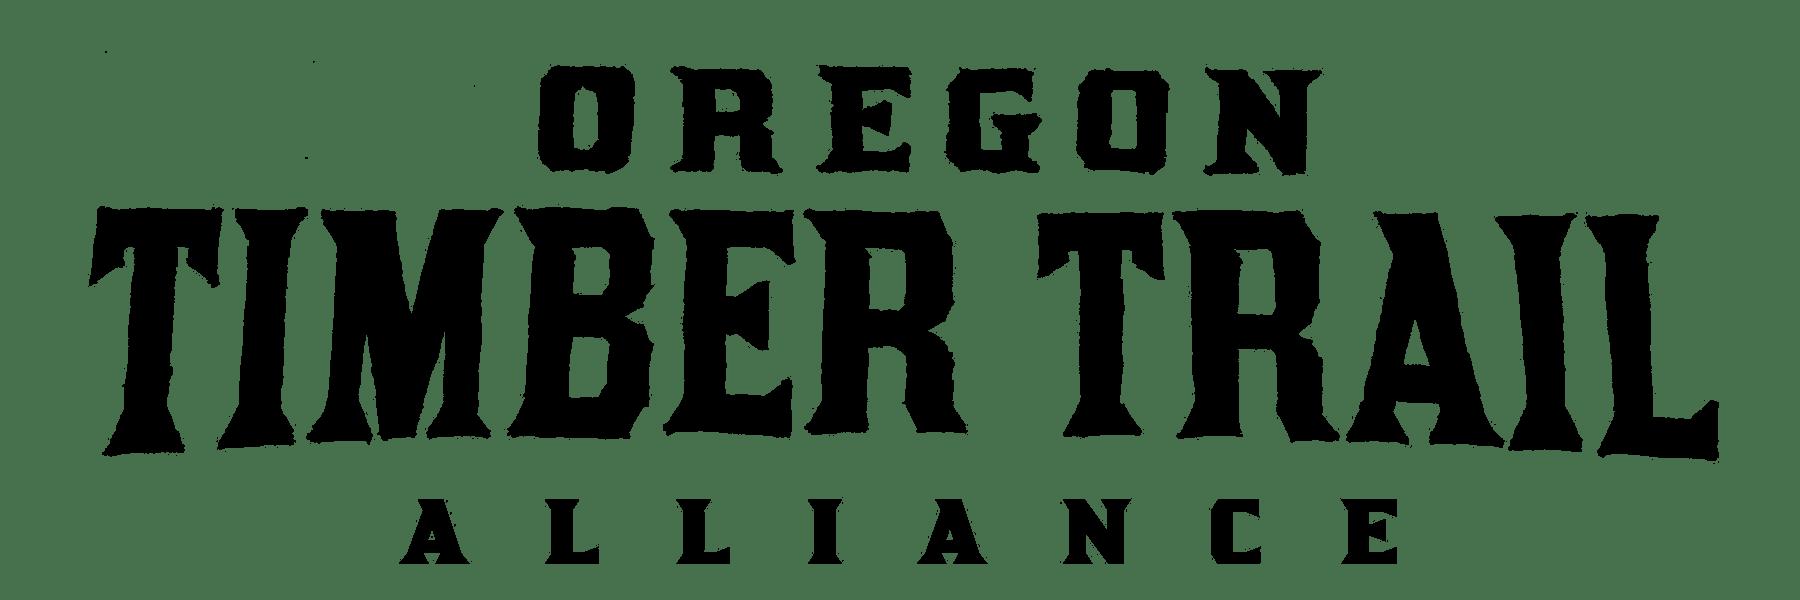 Oregon Timber Trail Alliance